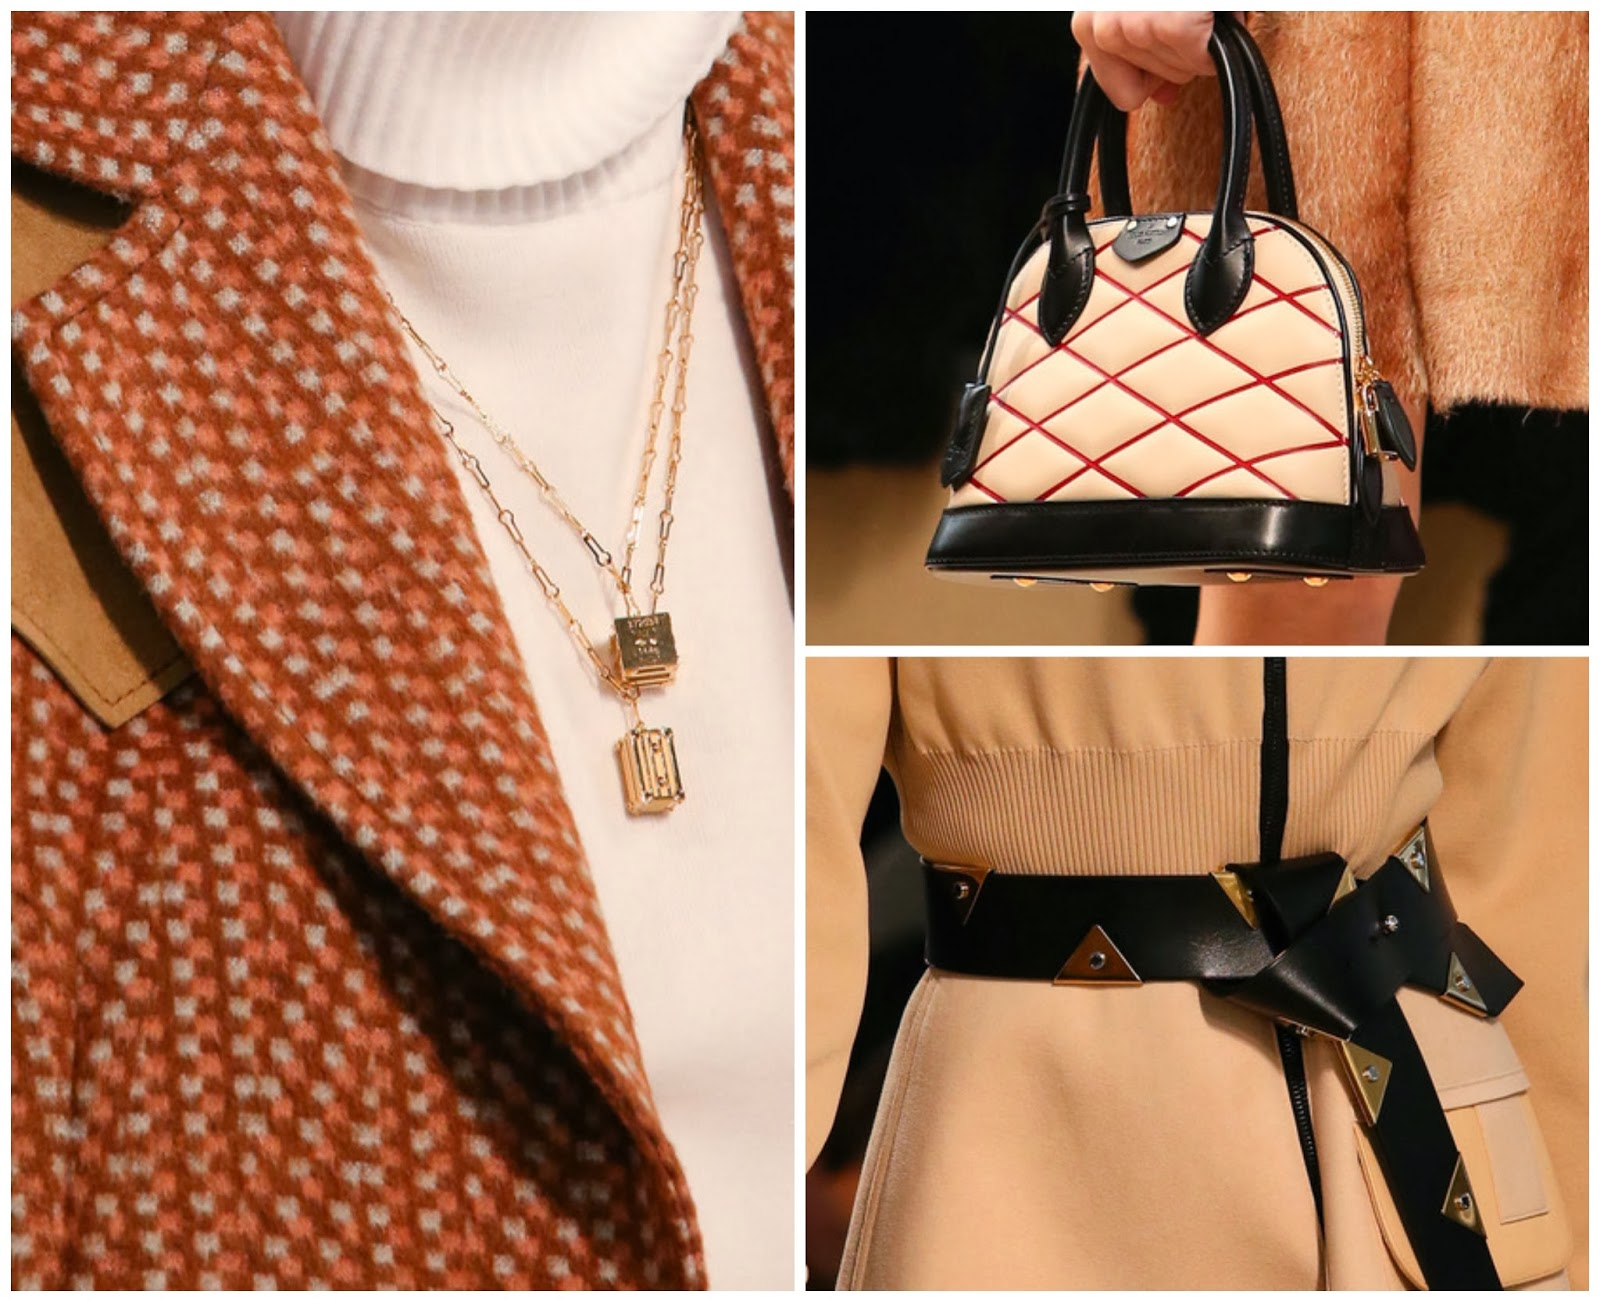 louis vuitton details FW 2014 nicolas ghesquiere gt fashion diary